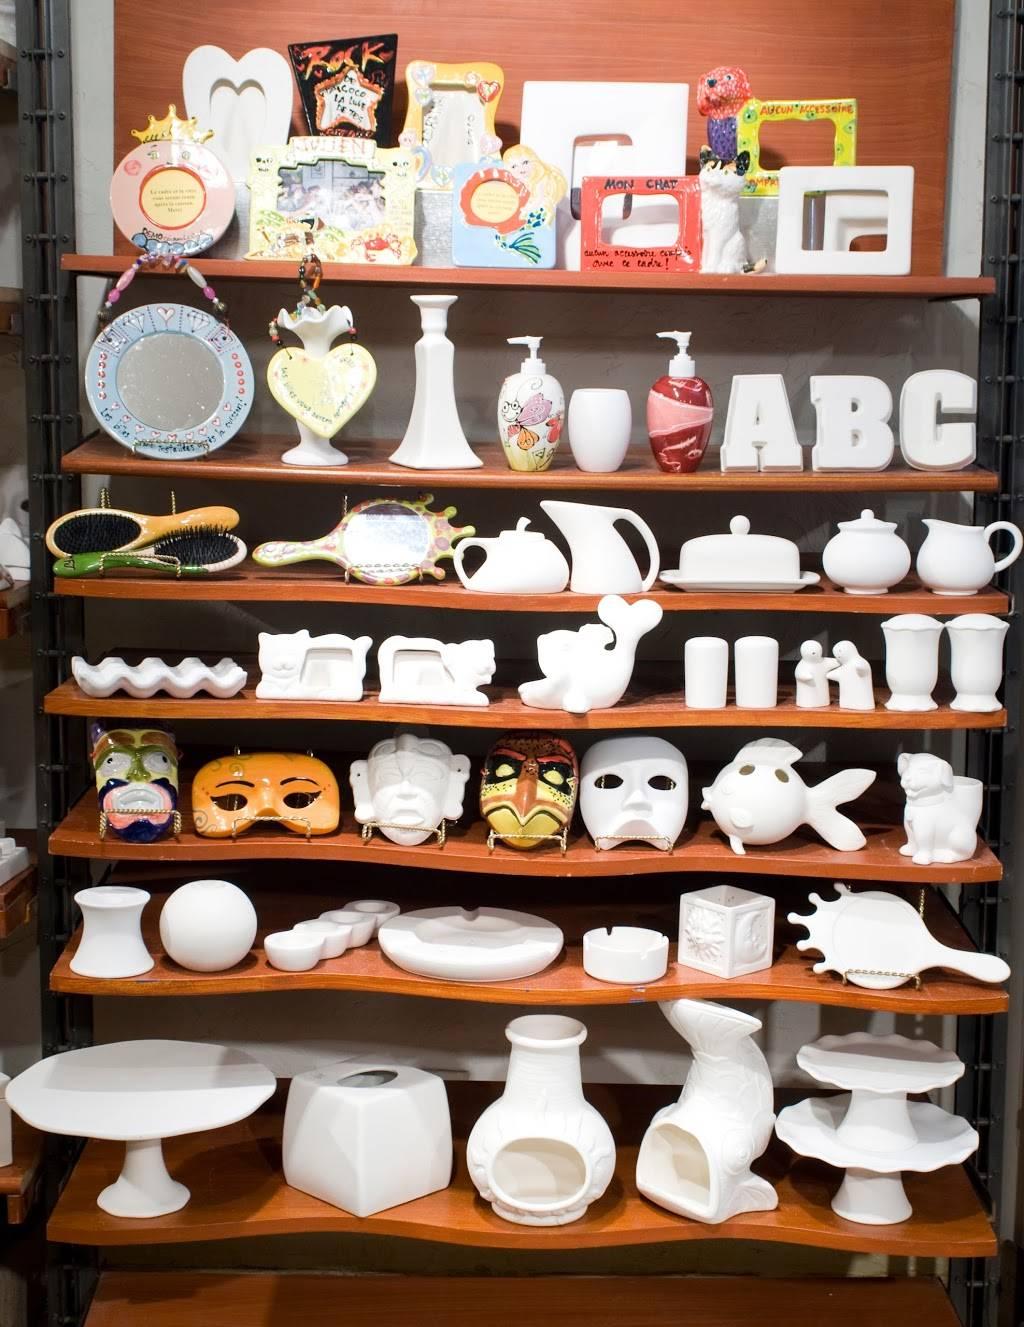 Ceramic Coffee Dollard-des-Ormeaux   cafe   3591 Boul Saint-Jean, Dollard-des-Ormeaux, QC H9G 1W9, Canada   5146242422 OR +1 514-624-2422